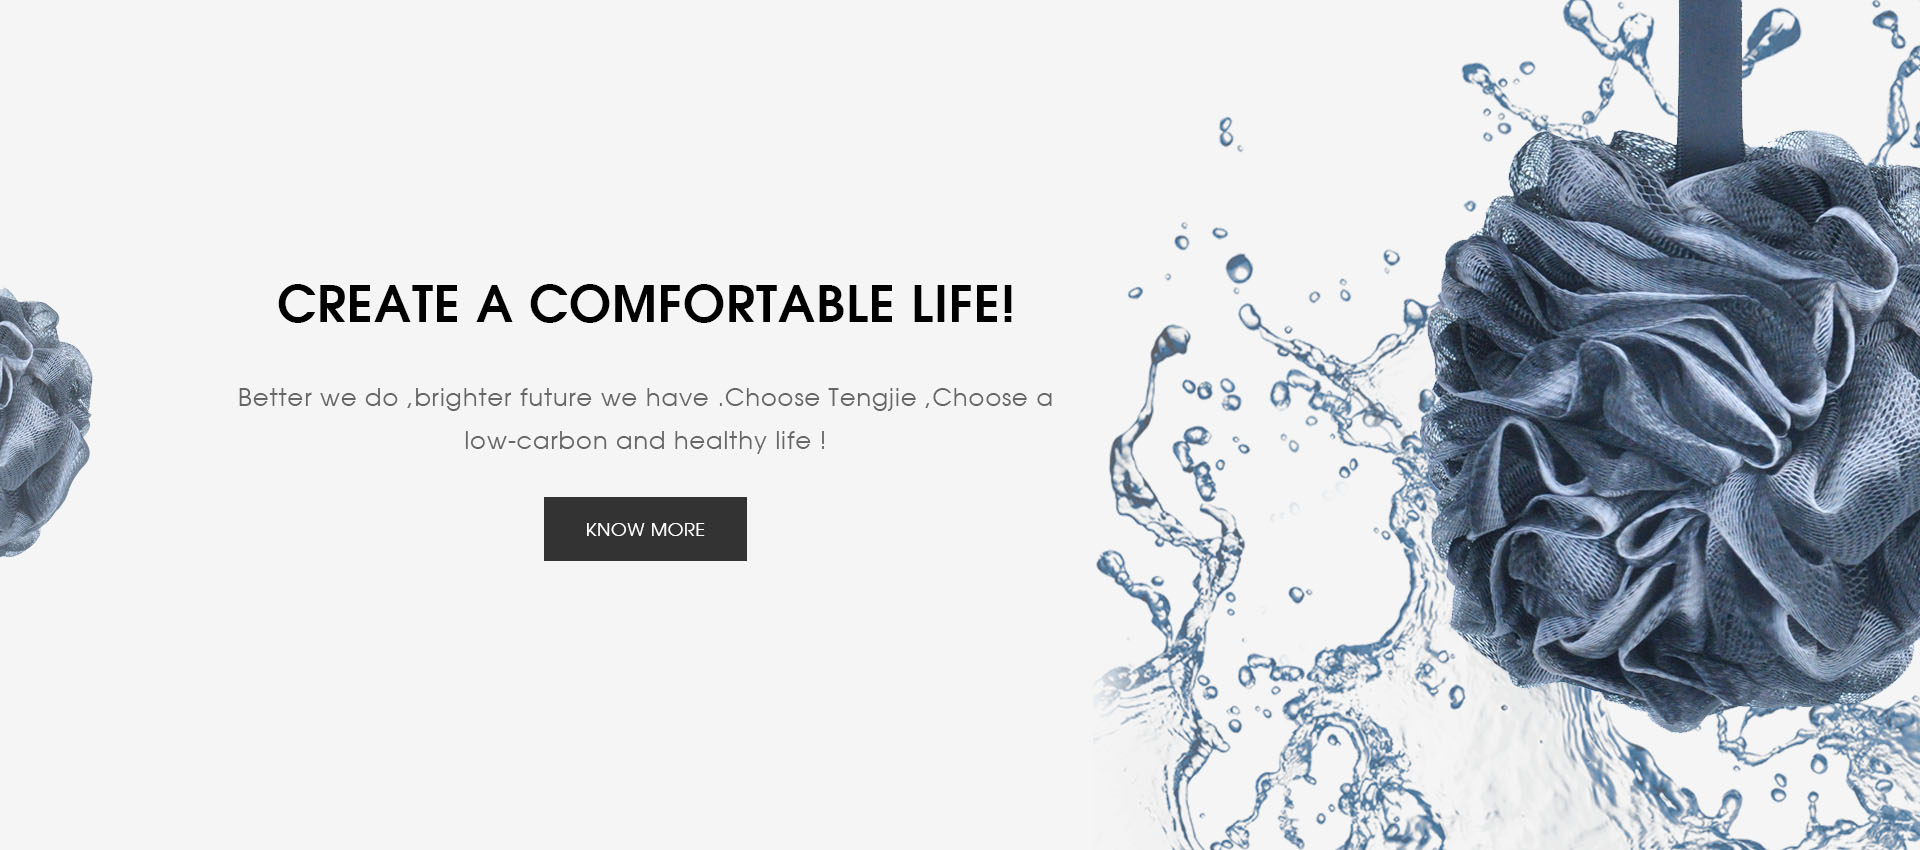 Create a comfortable life!